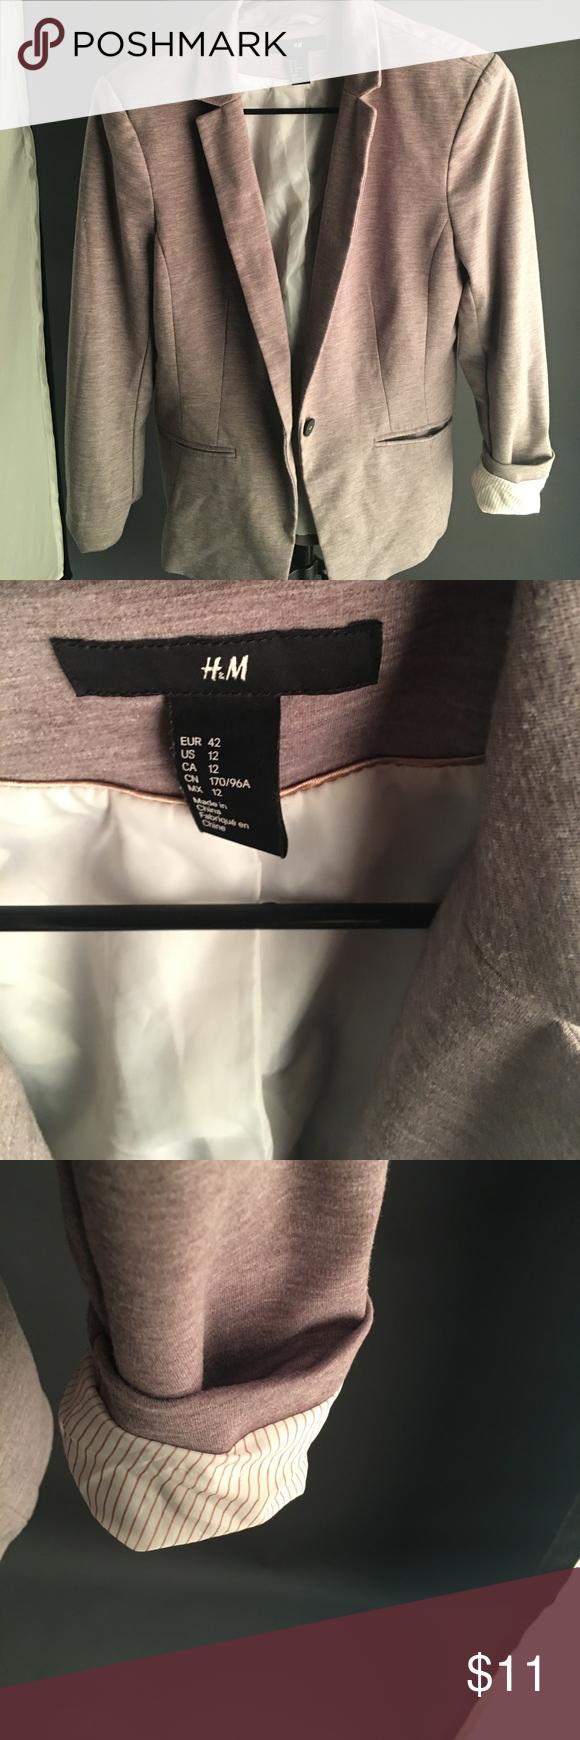 Knit blazer Good condition H&M Jackets & Coats Blazers